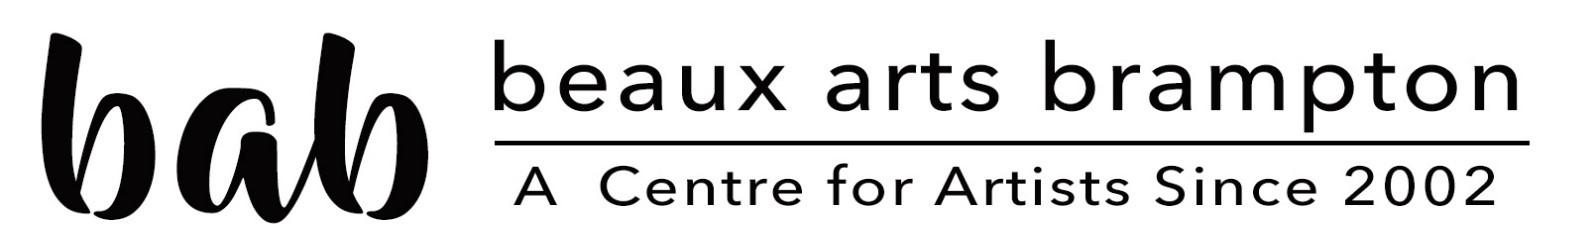 Beaux-Arts_CNTR-4-ARTIST-logo